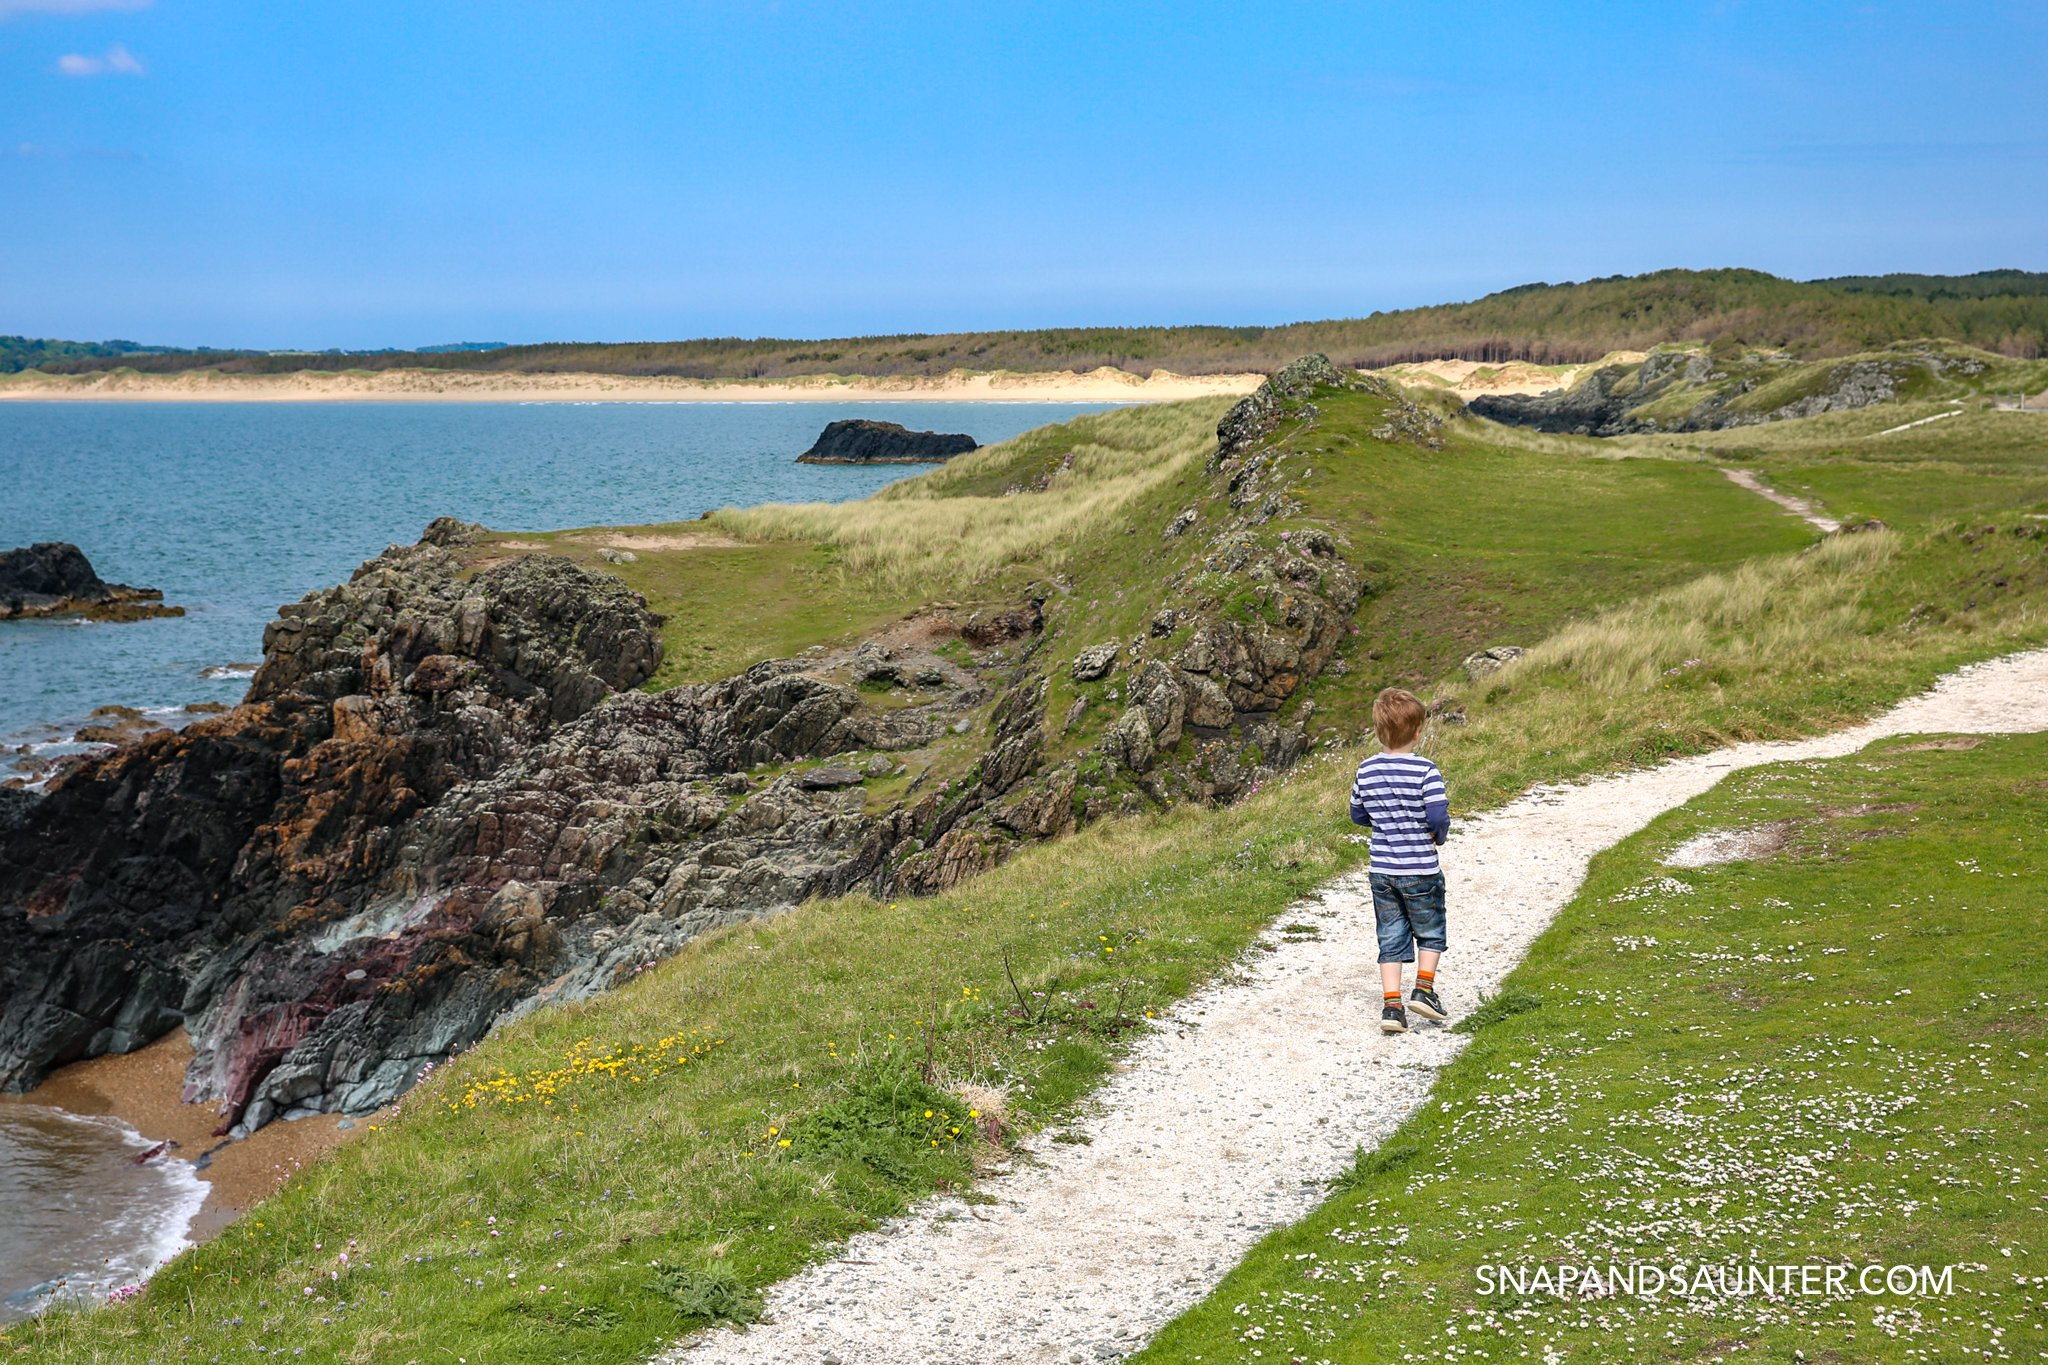 A boy walking towards Llandwyn Island in Anglesey in Wales